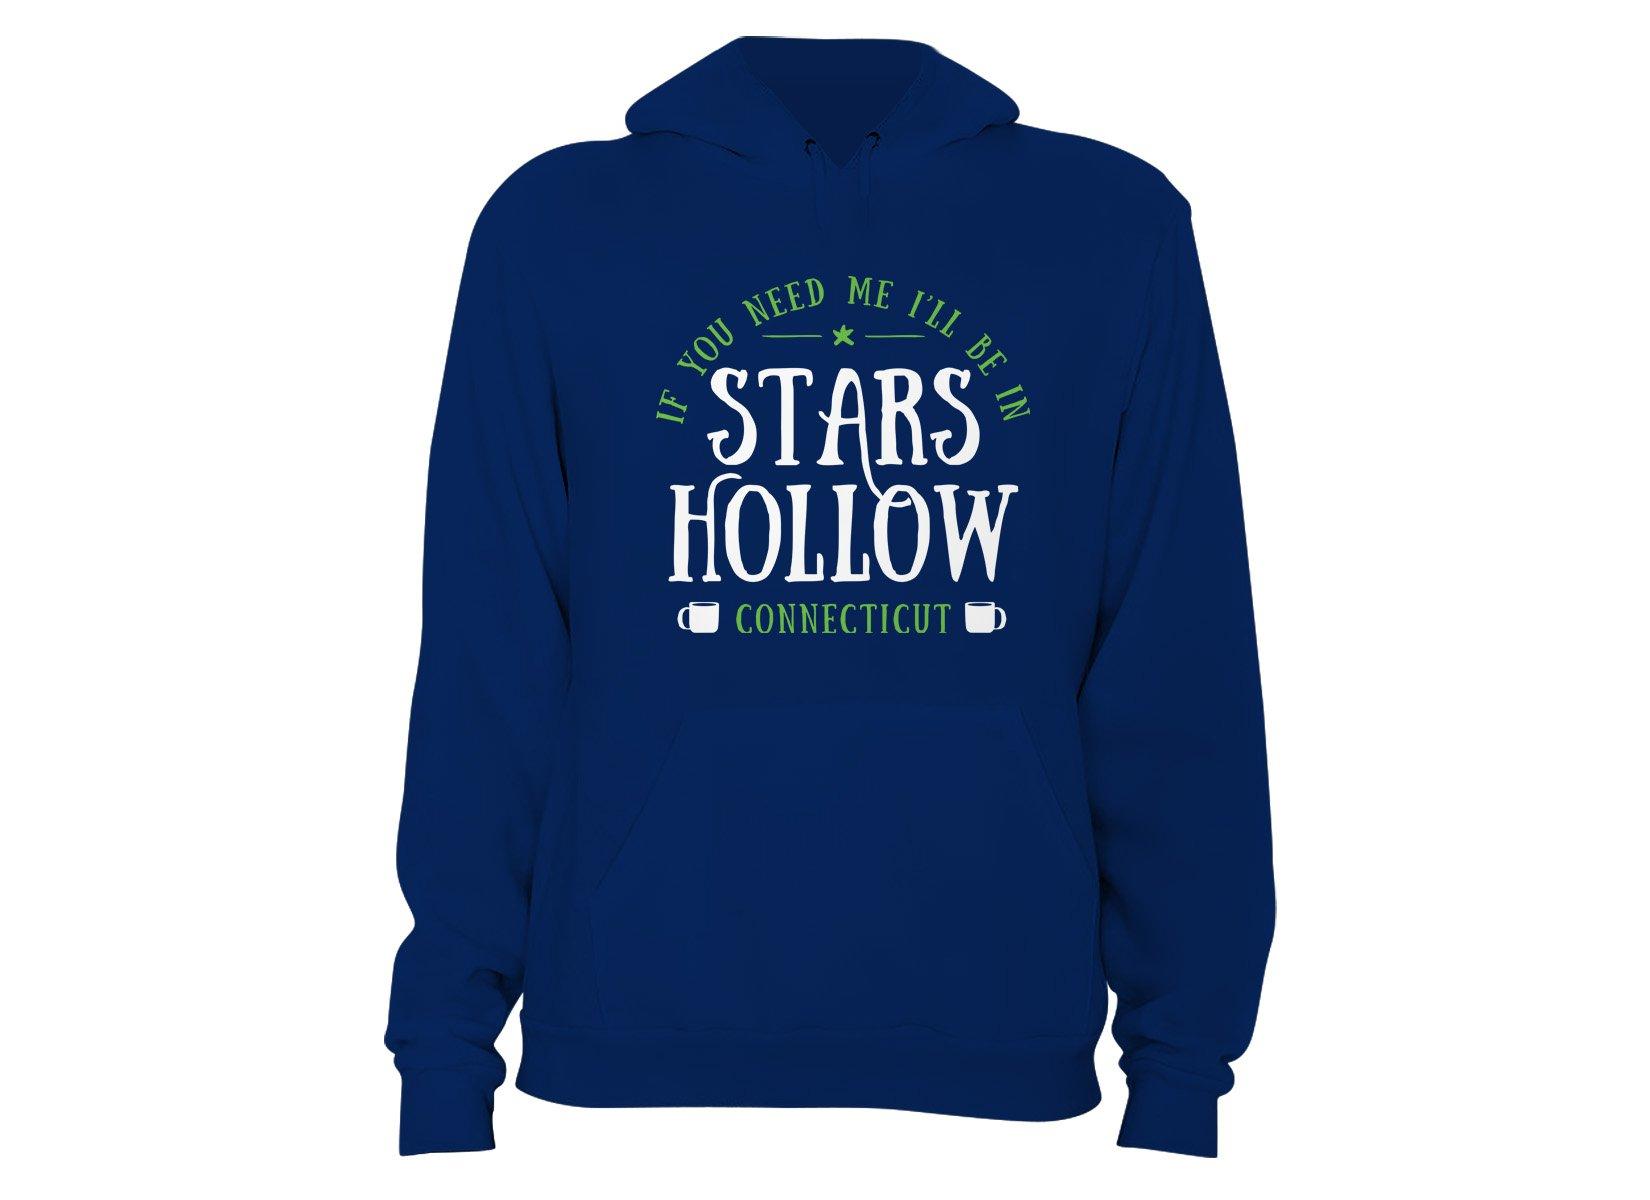 Stars Hollow on Hoodie